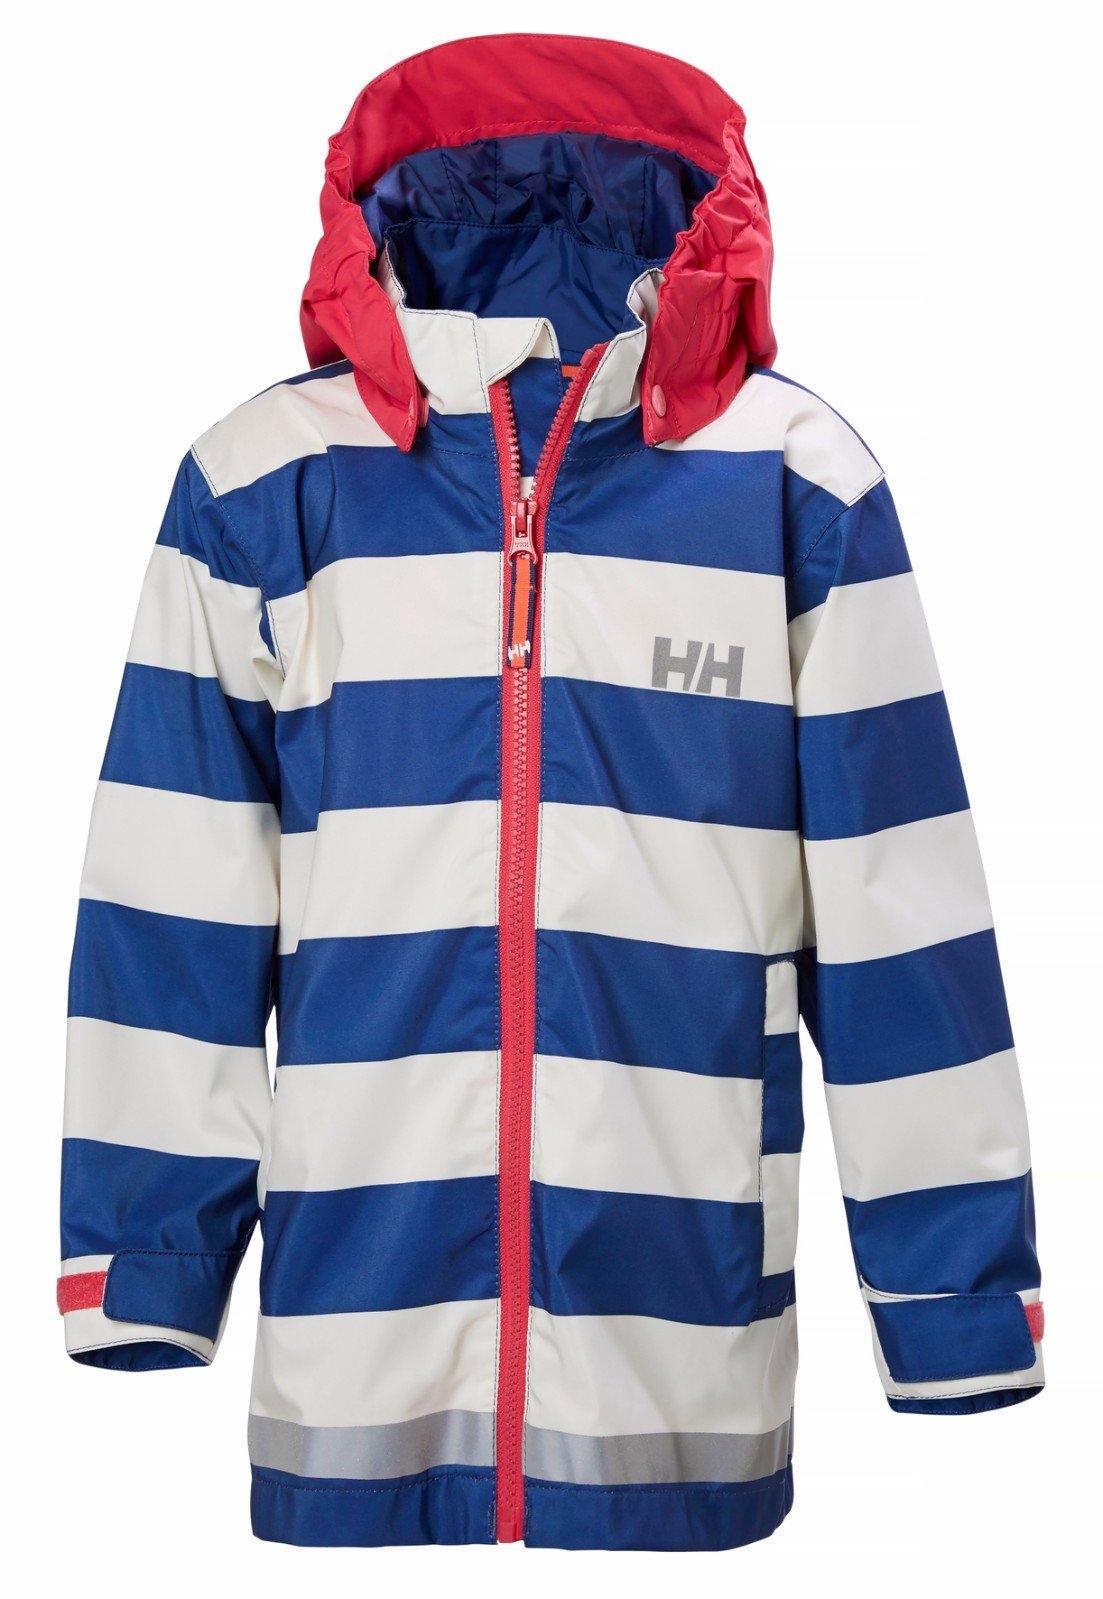 Helly Hansen Girl's Kid's Amalie Rain Jacket, Marine Blue Stripe, 8